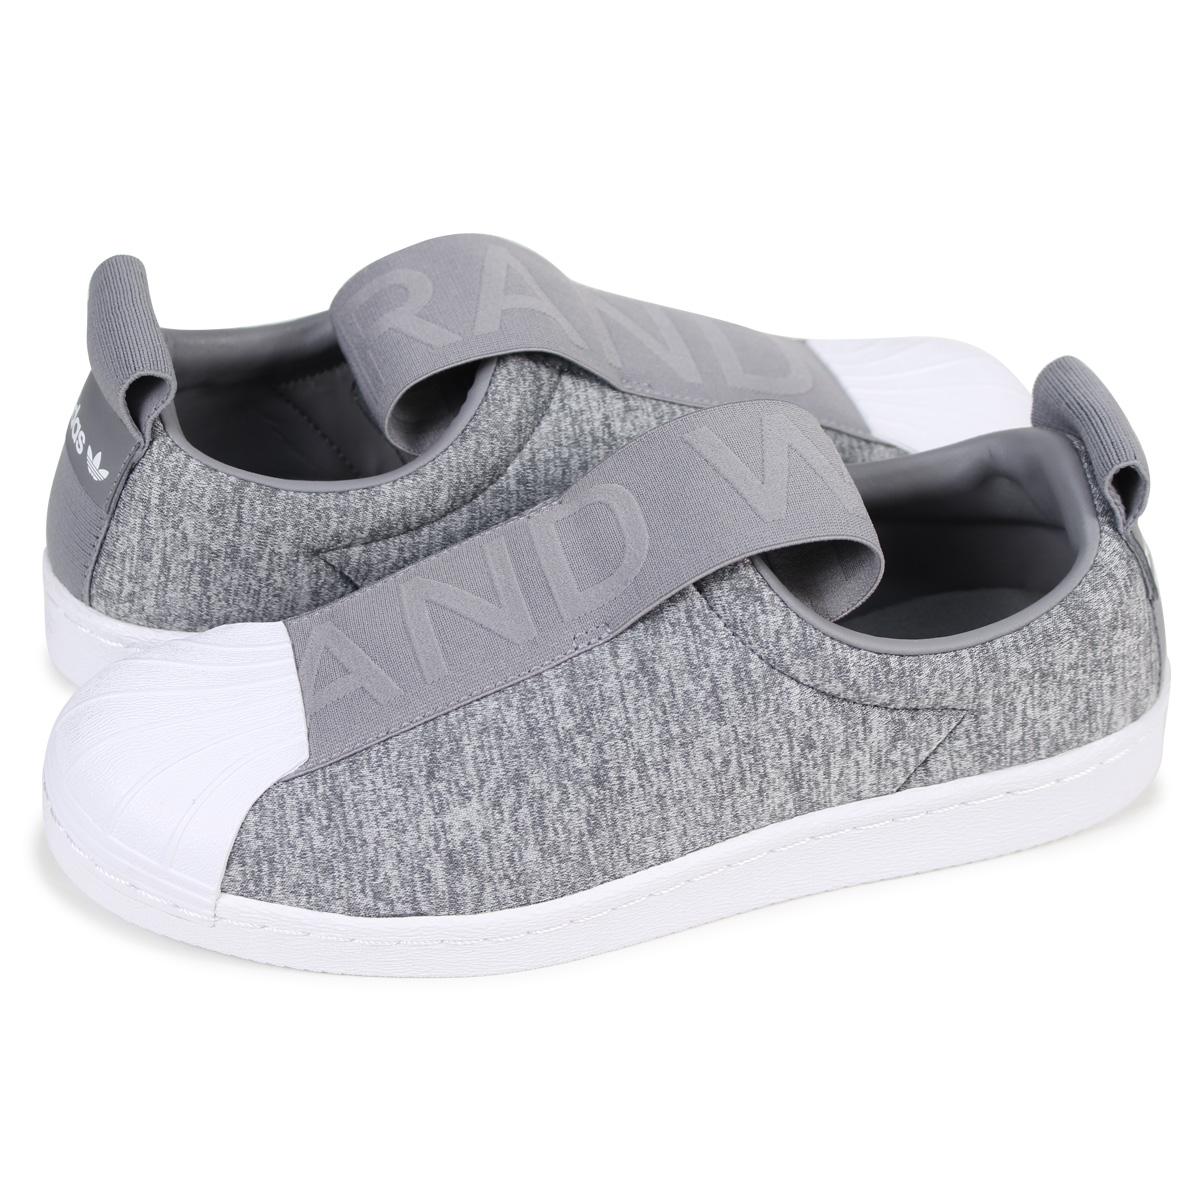 size 40 e3072 1f230 adidas Originals SUPER STAR BW3S SLIP-ON W Adidas superstar Lady's sneakers  slip-ons CQ2520 gray originals